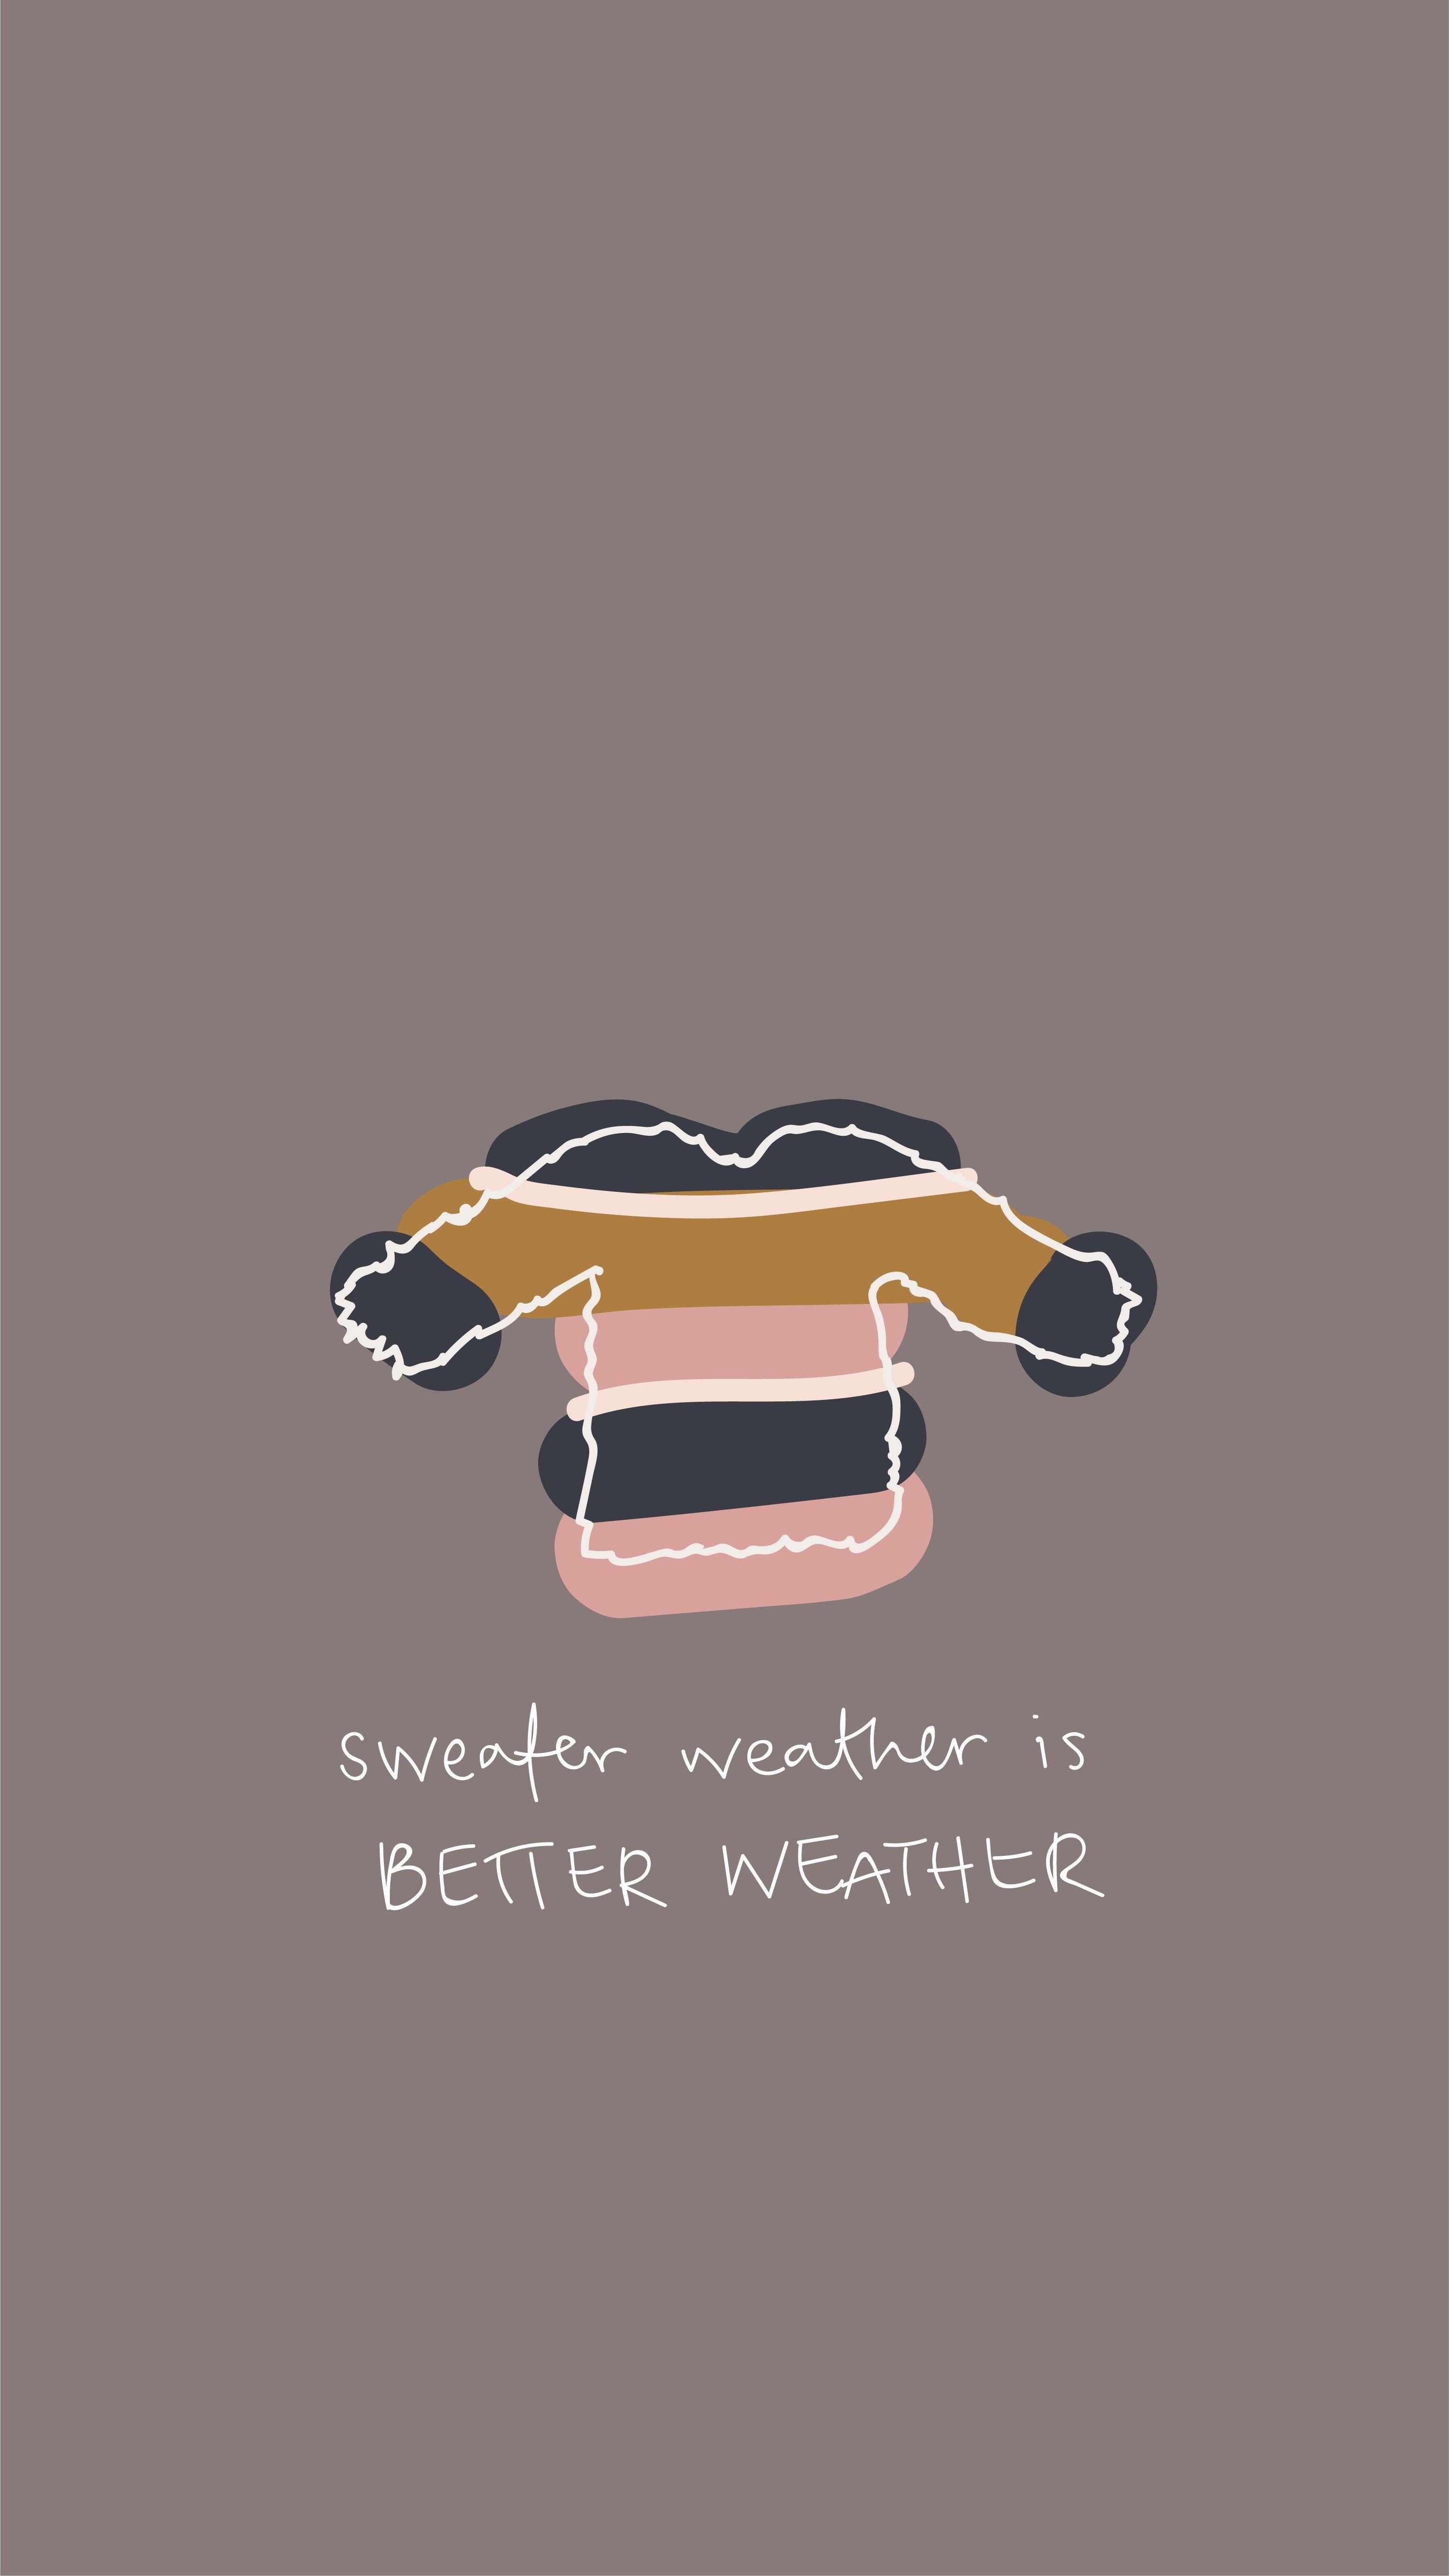 arvowear #sweater #weather #fall #autumn #phonebackground ...